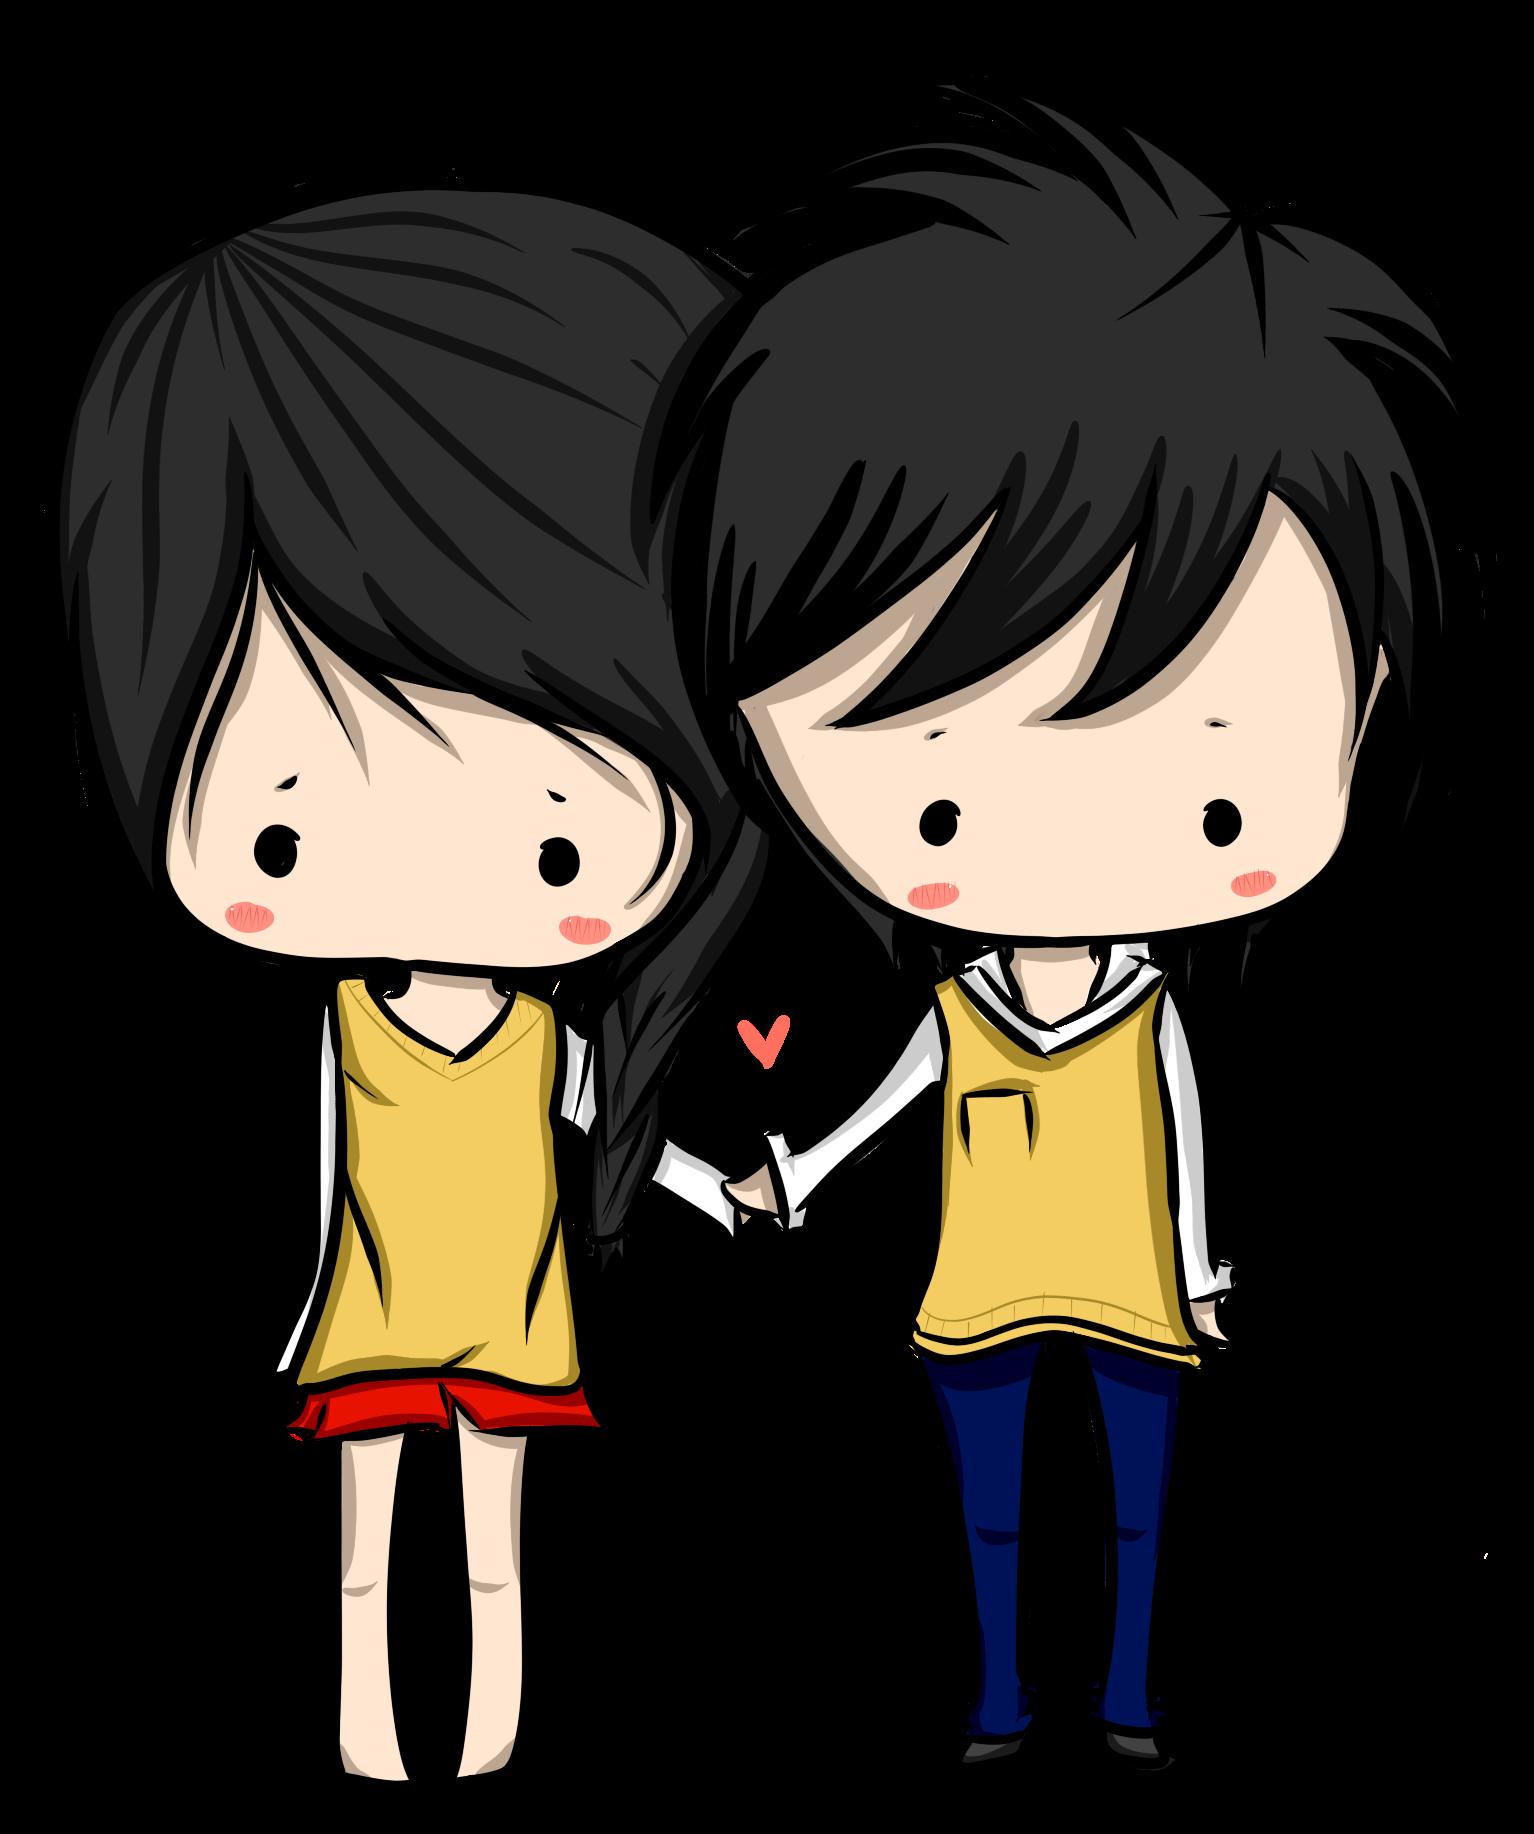 Chibi Couple (: by surlinaa on DeviantArt